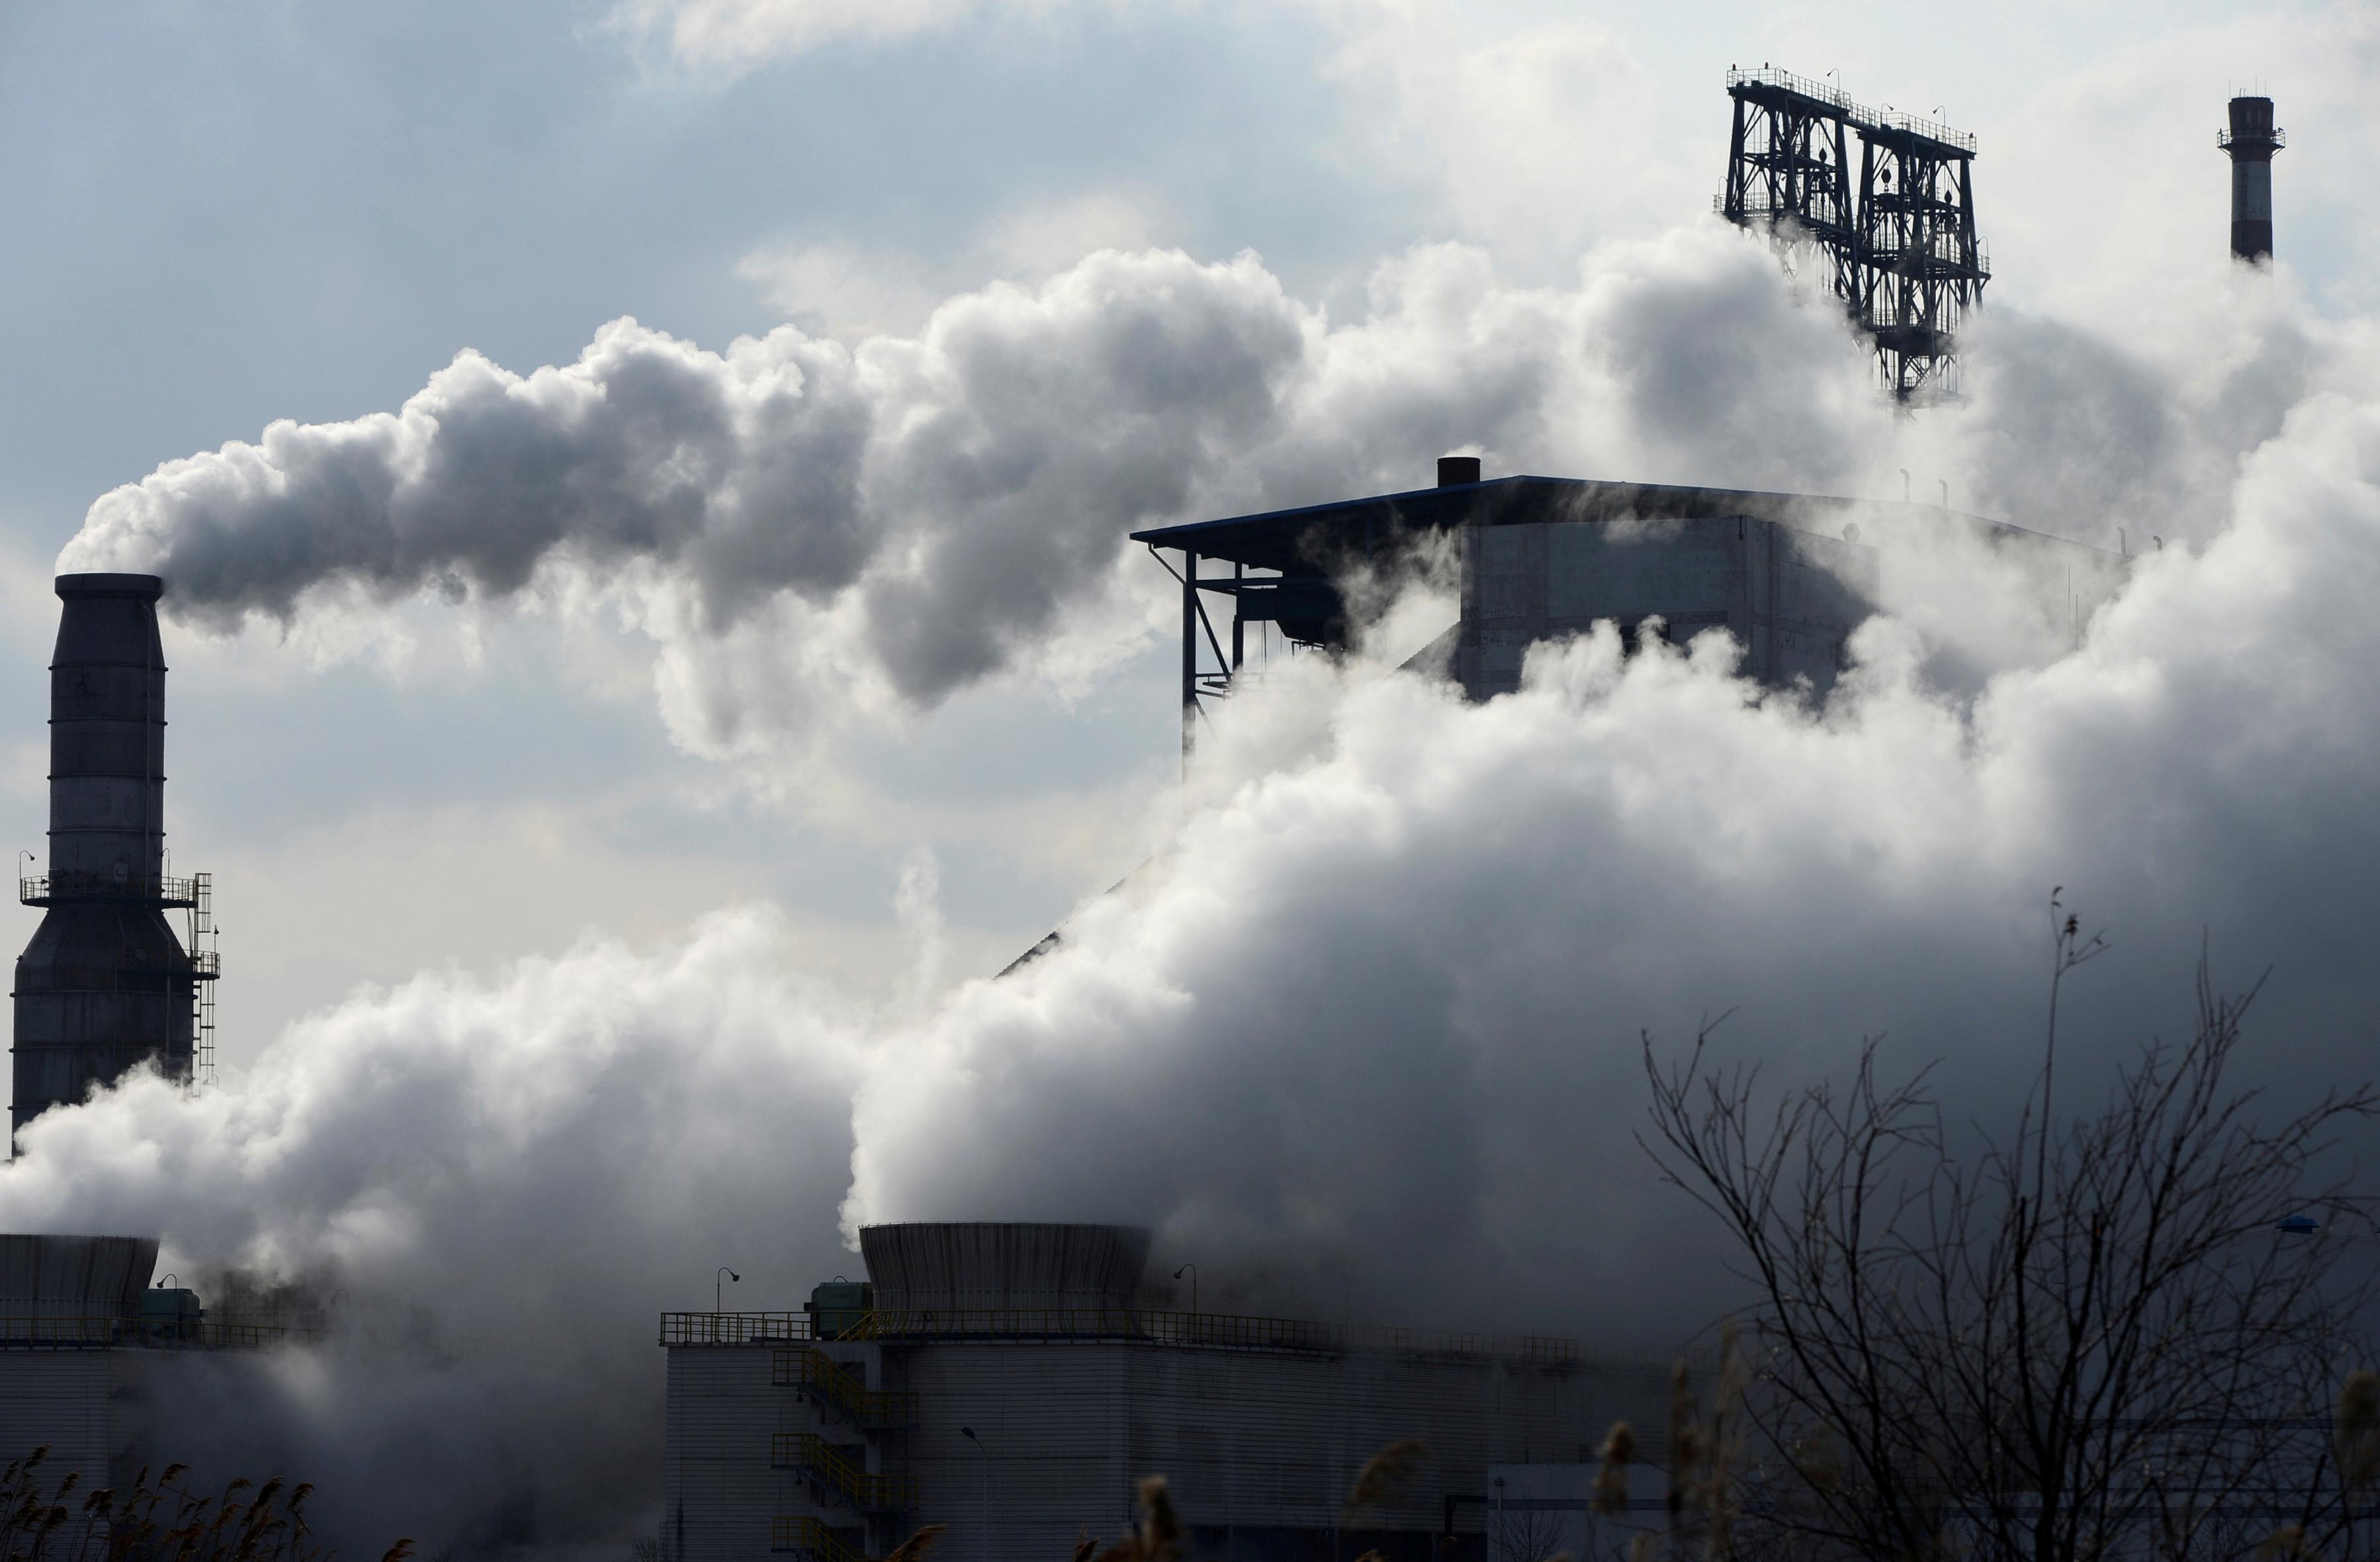 Smoke rises from chimneys at a Sinopec refinery in Qingdao, Shangdong province, China, February 9, 2014.  REUTERS/China Daily